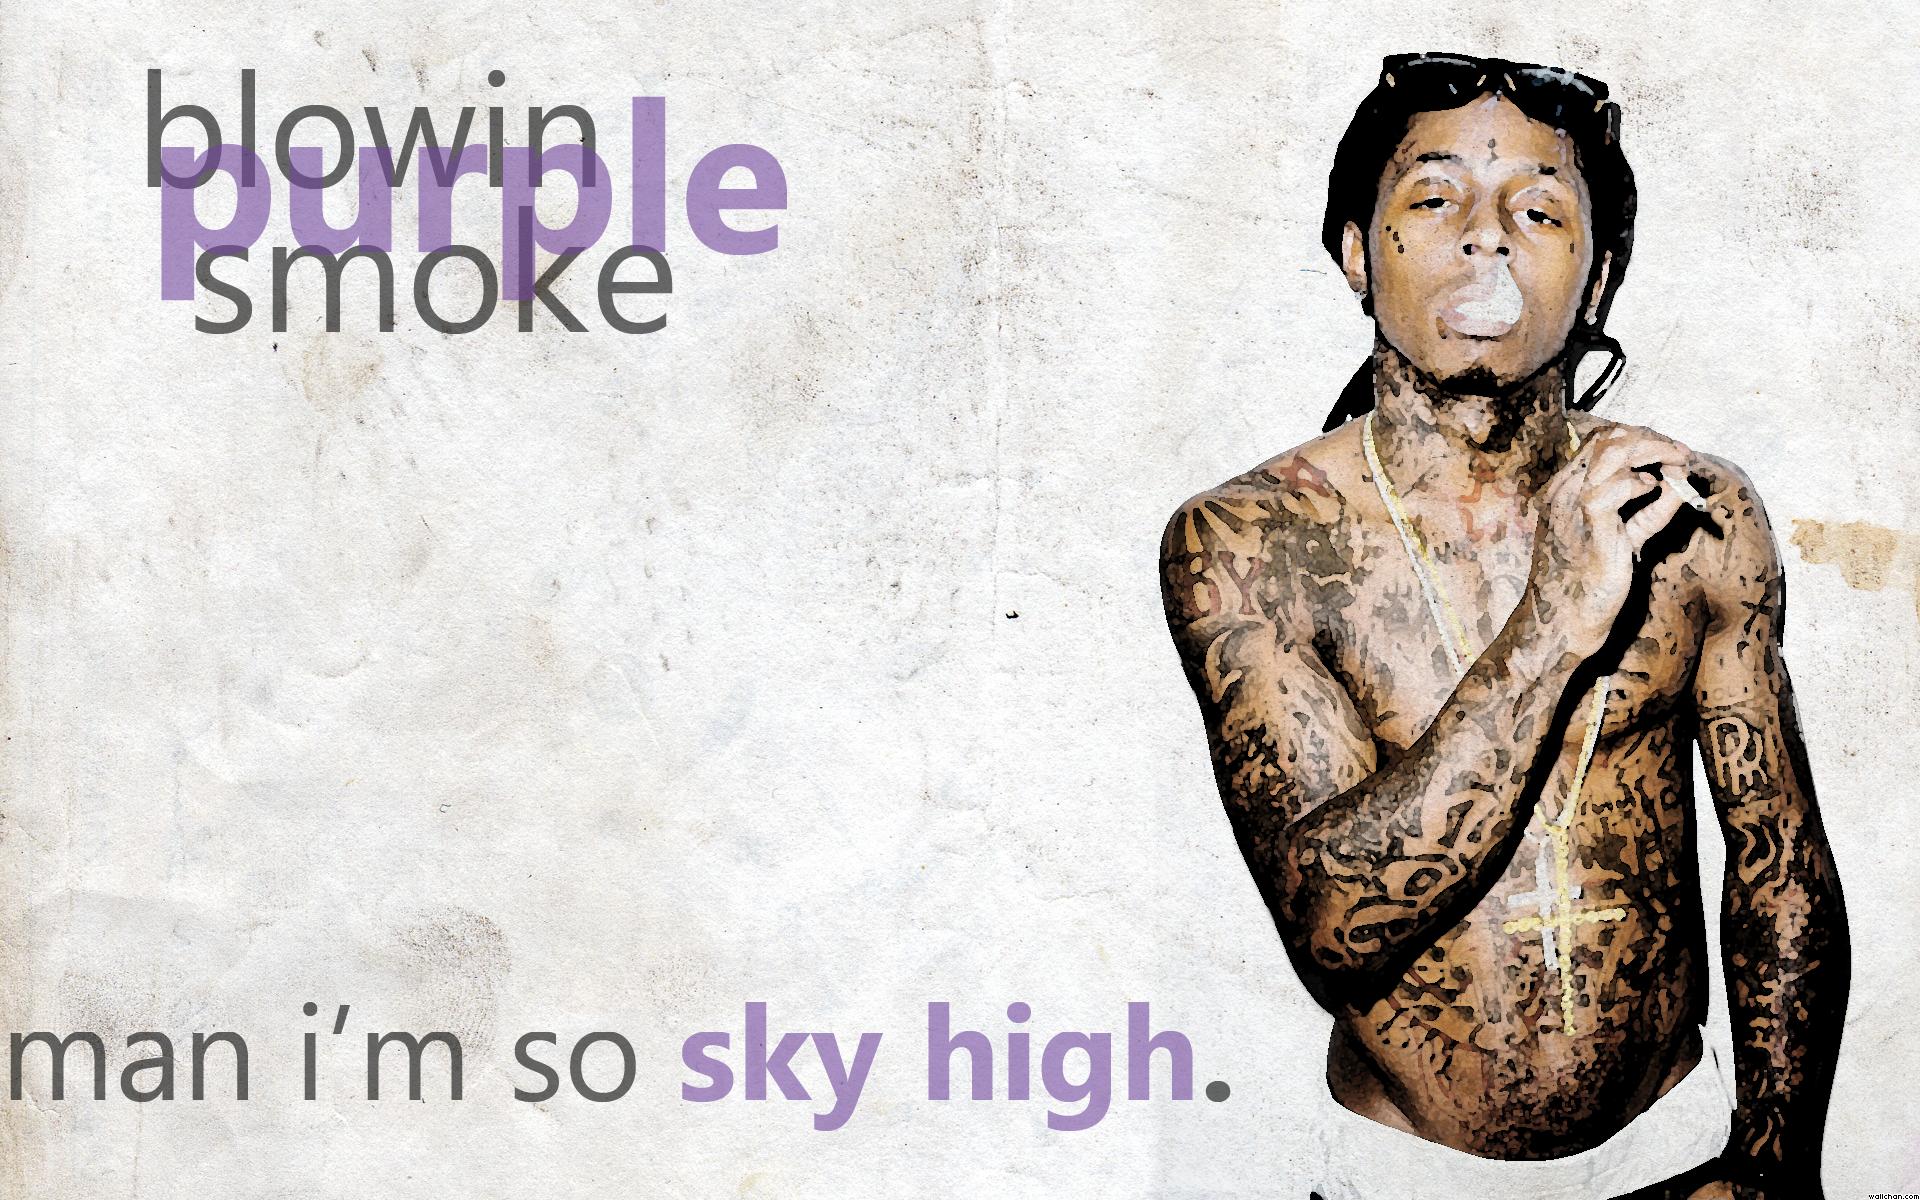 Lil Wayne Background   Wallpaper High Definition High Quality 1920x1200